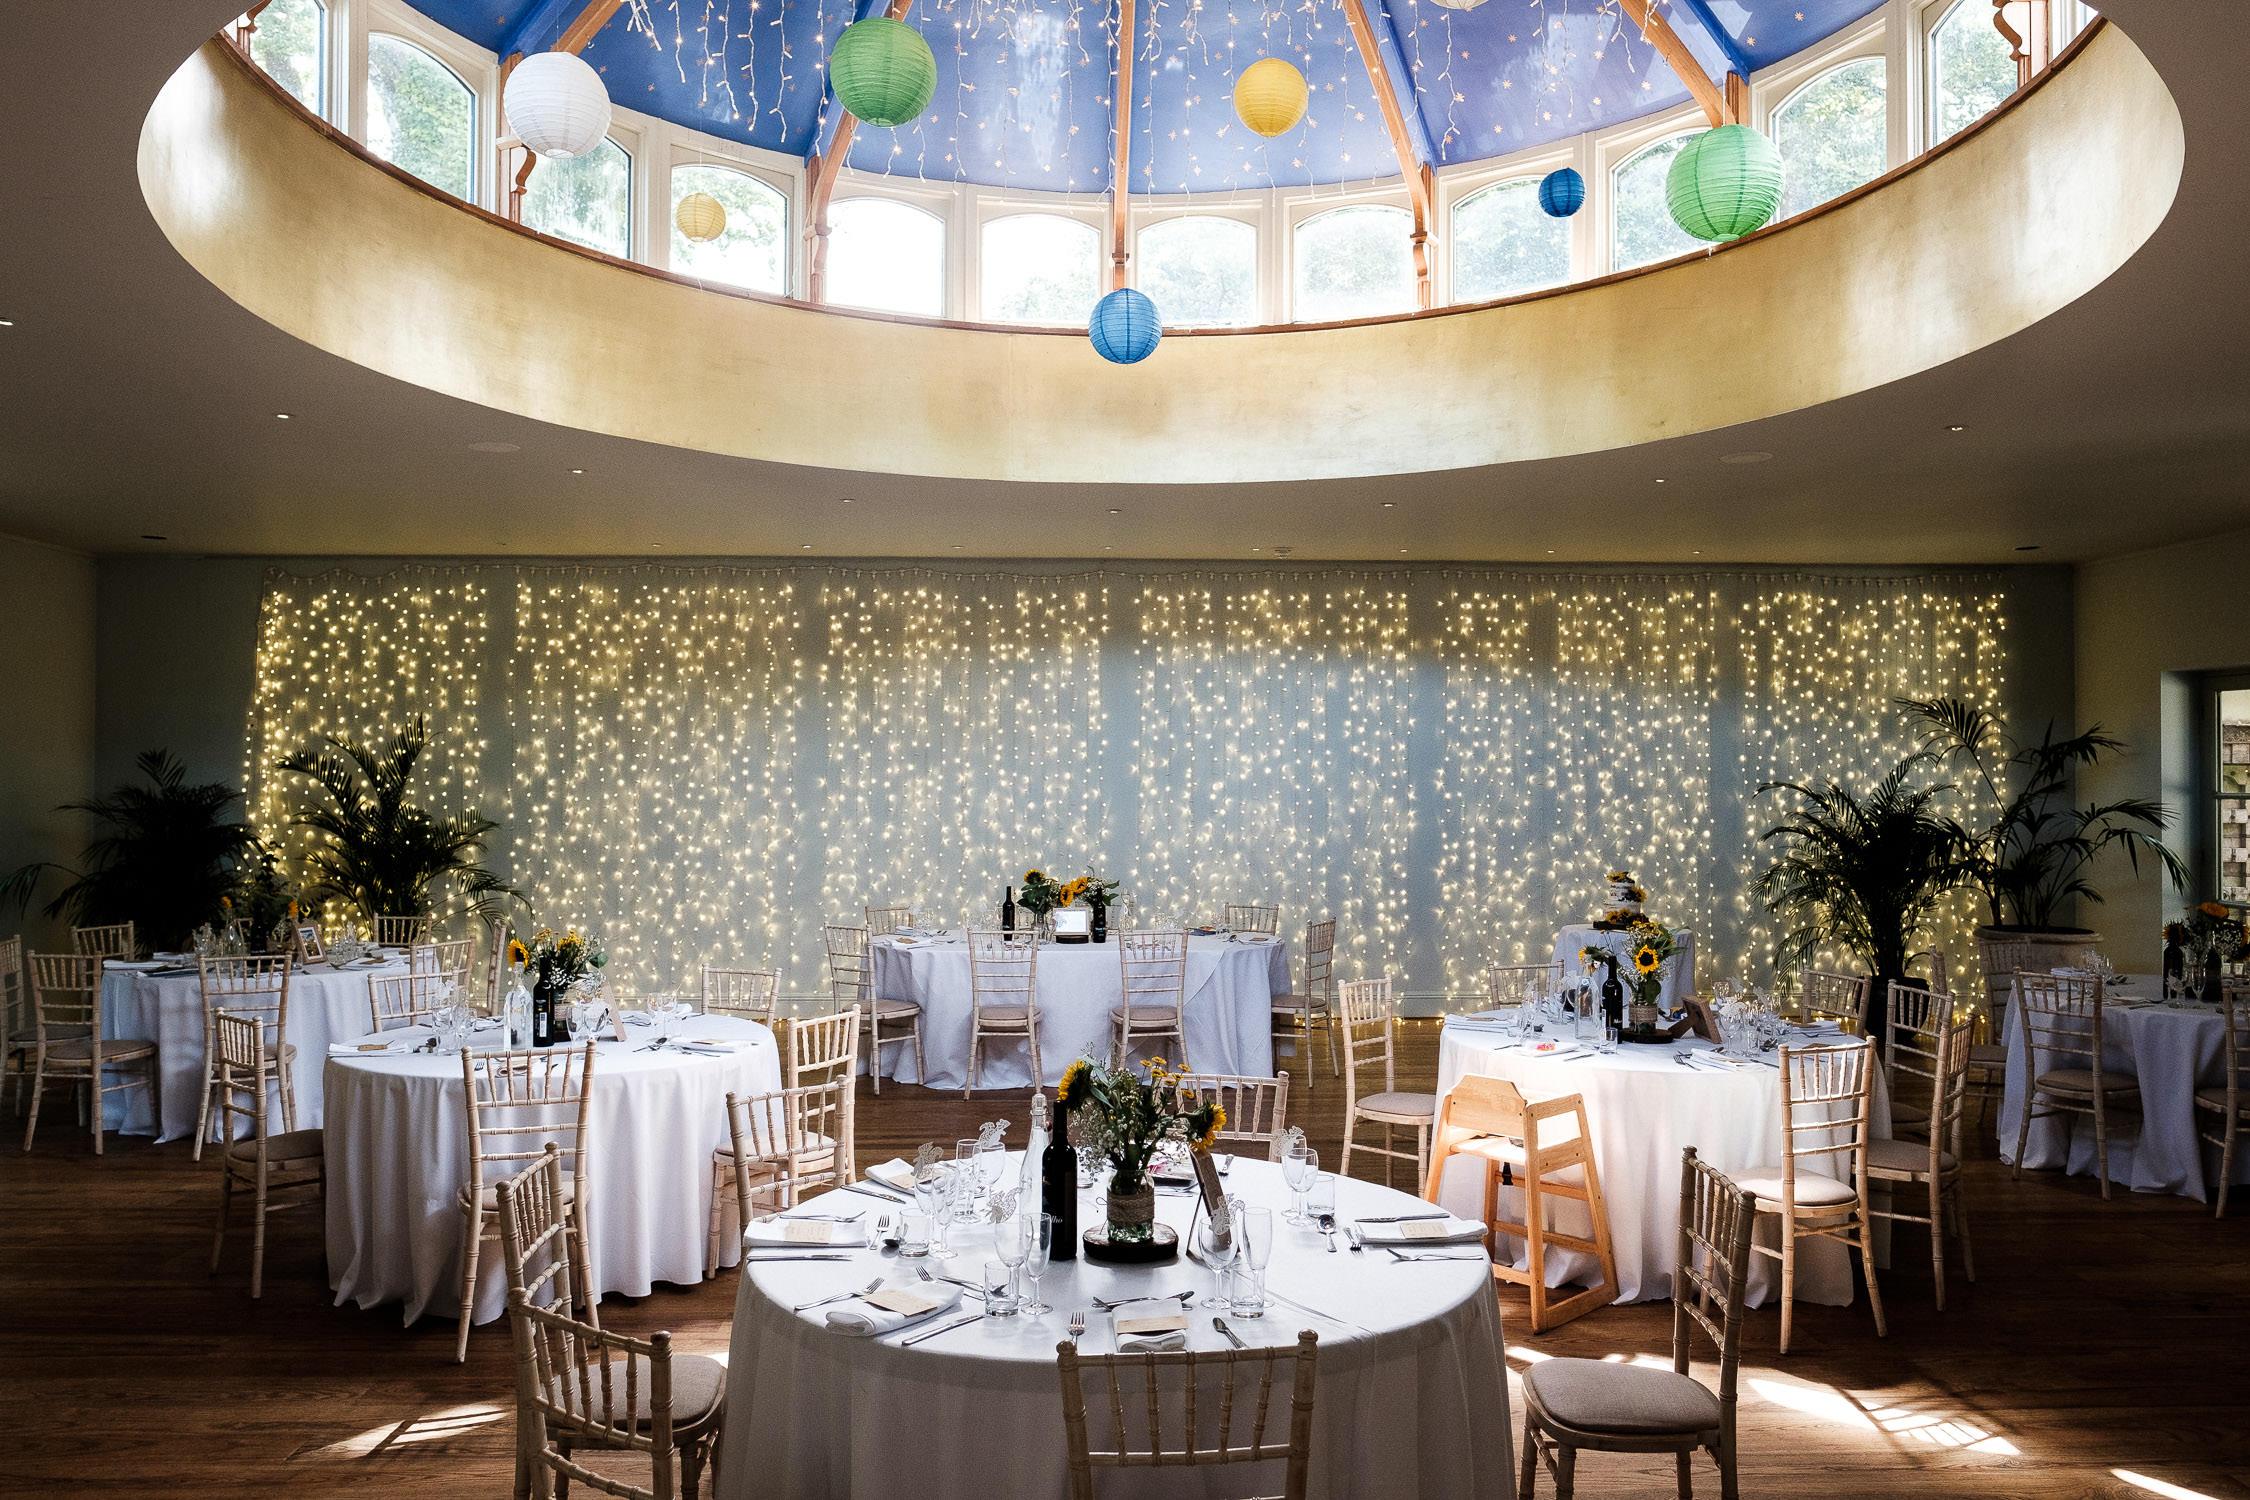 matara centre hilarium for wedding breakfast